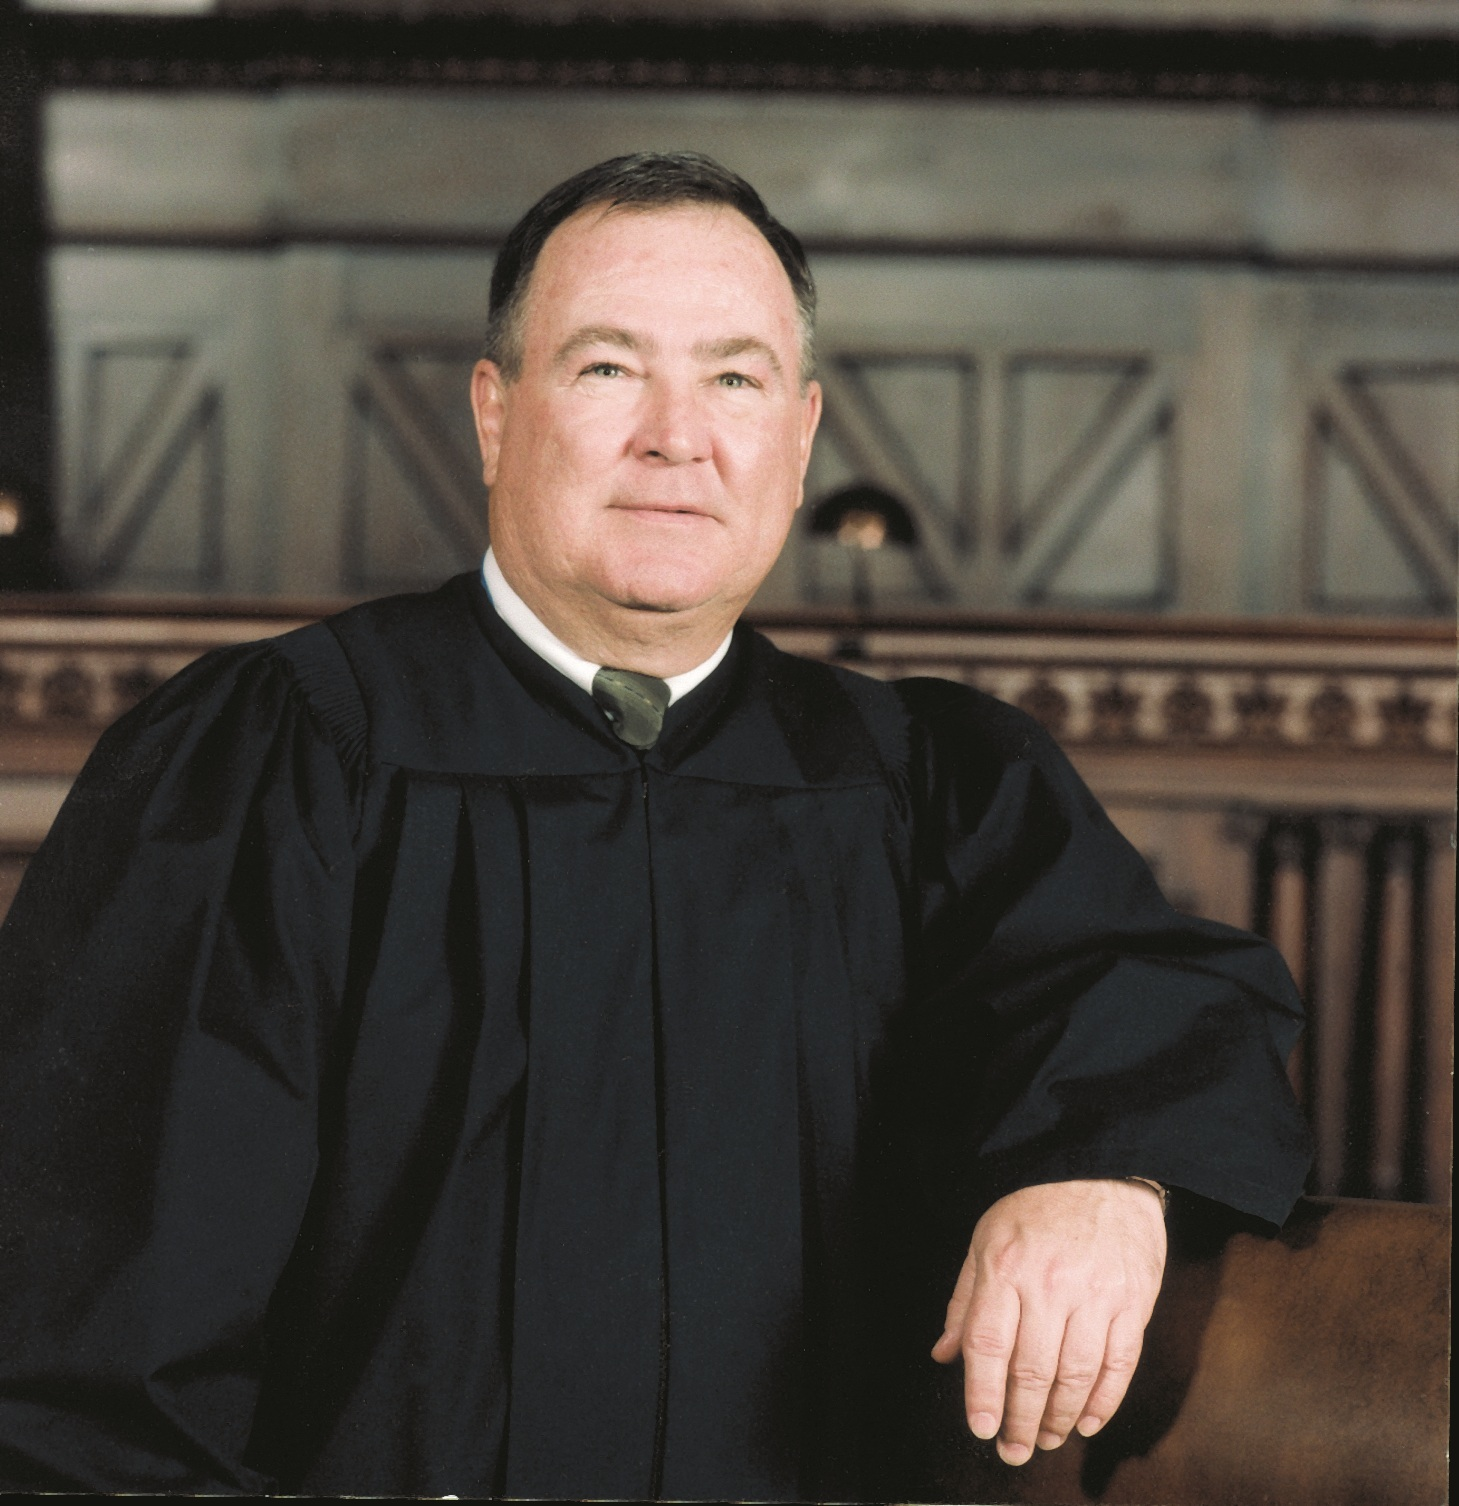 Commonwealth court judge bernard l. mcginley